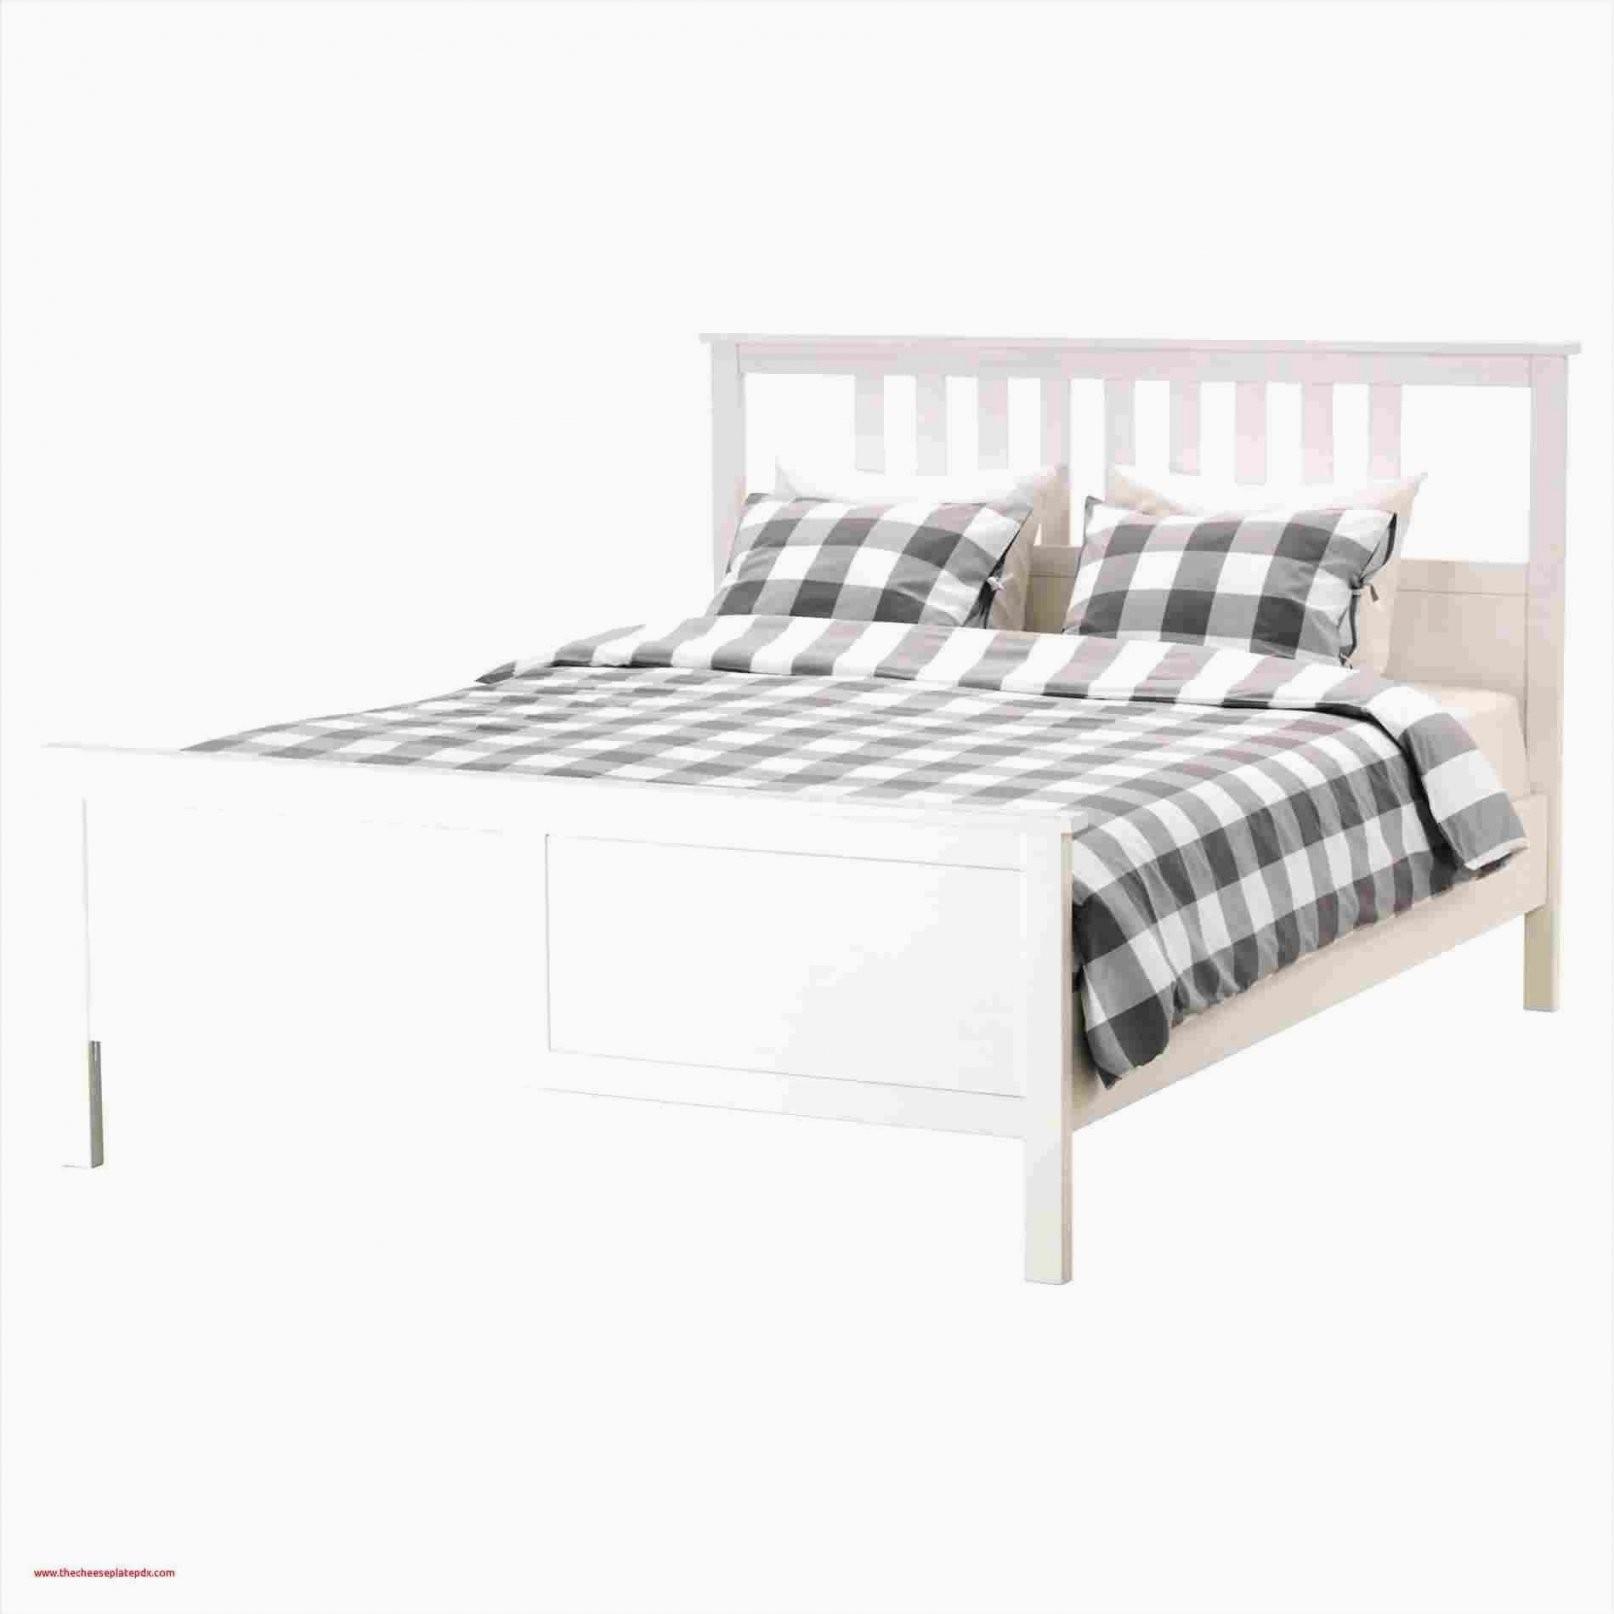 Ikea Bedden 160 X 200 Opmerkelijke Ikea Betten 160—200 Weiss von Ikea Bettgestell 160X200 Photo